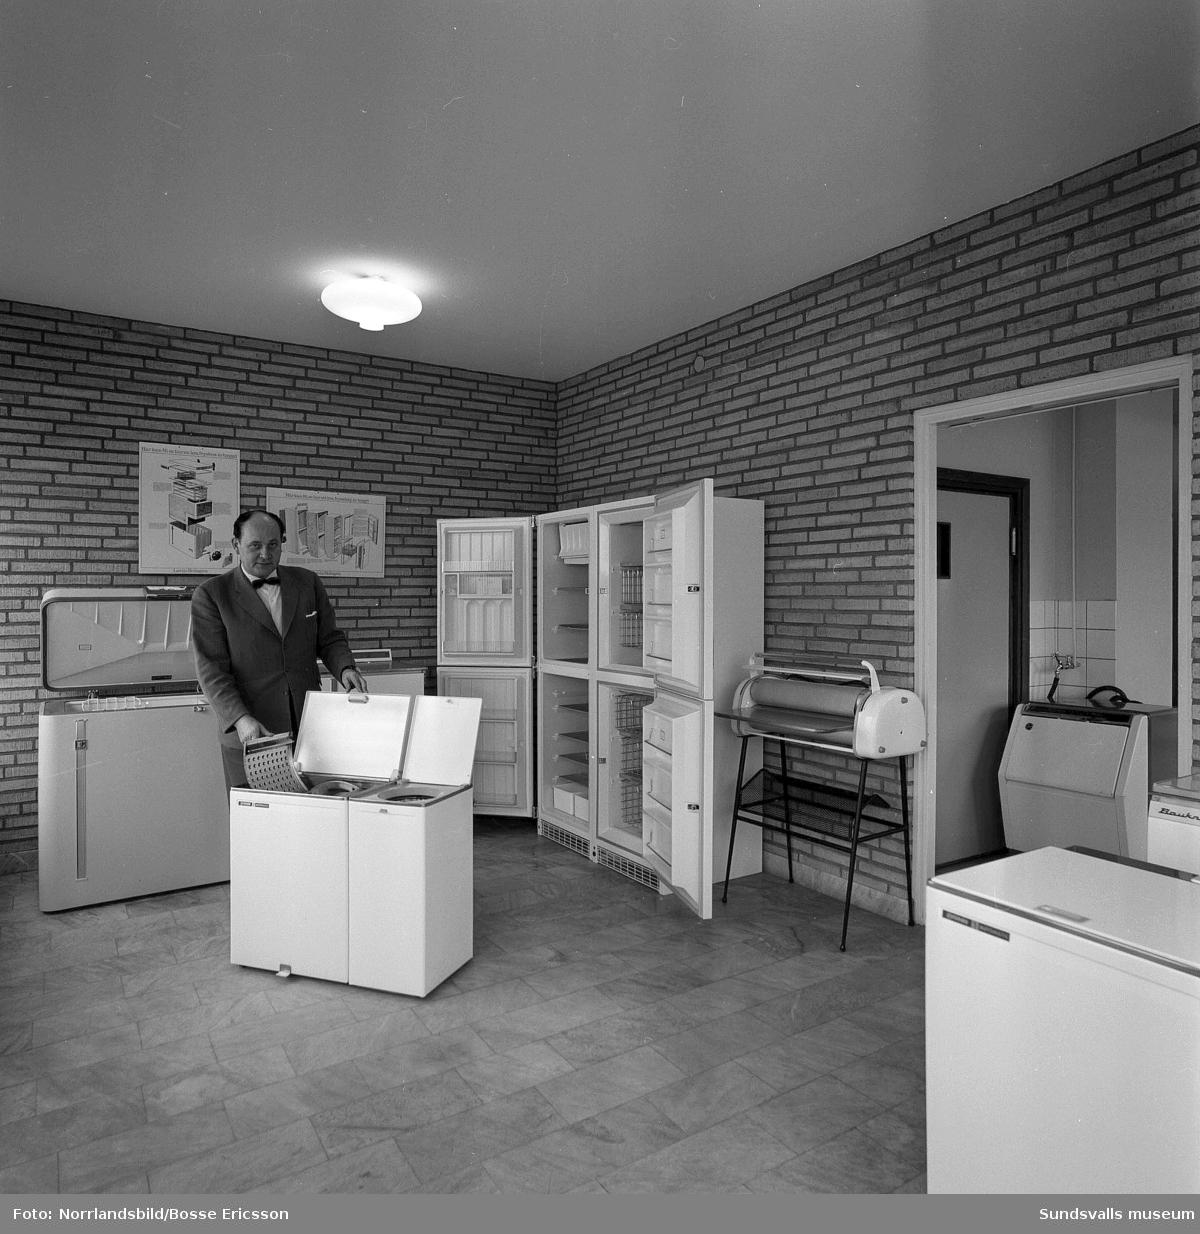 OGEA hushållsmaskiner, nyöppnad affär på Fridhemsgatan 80.